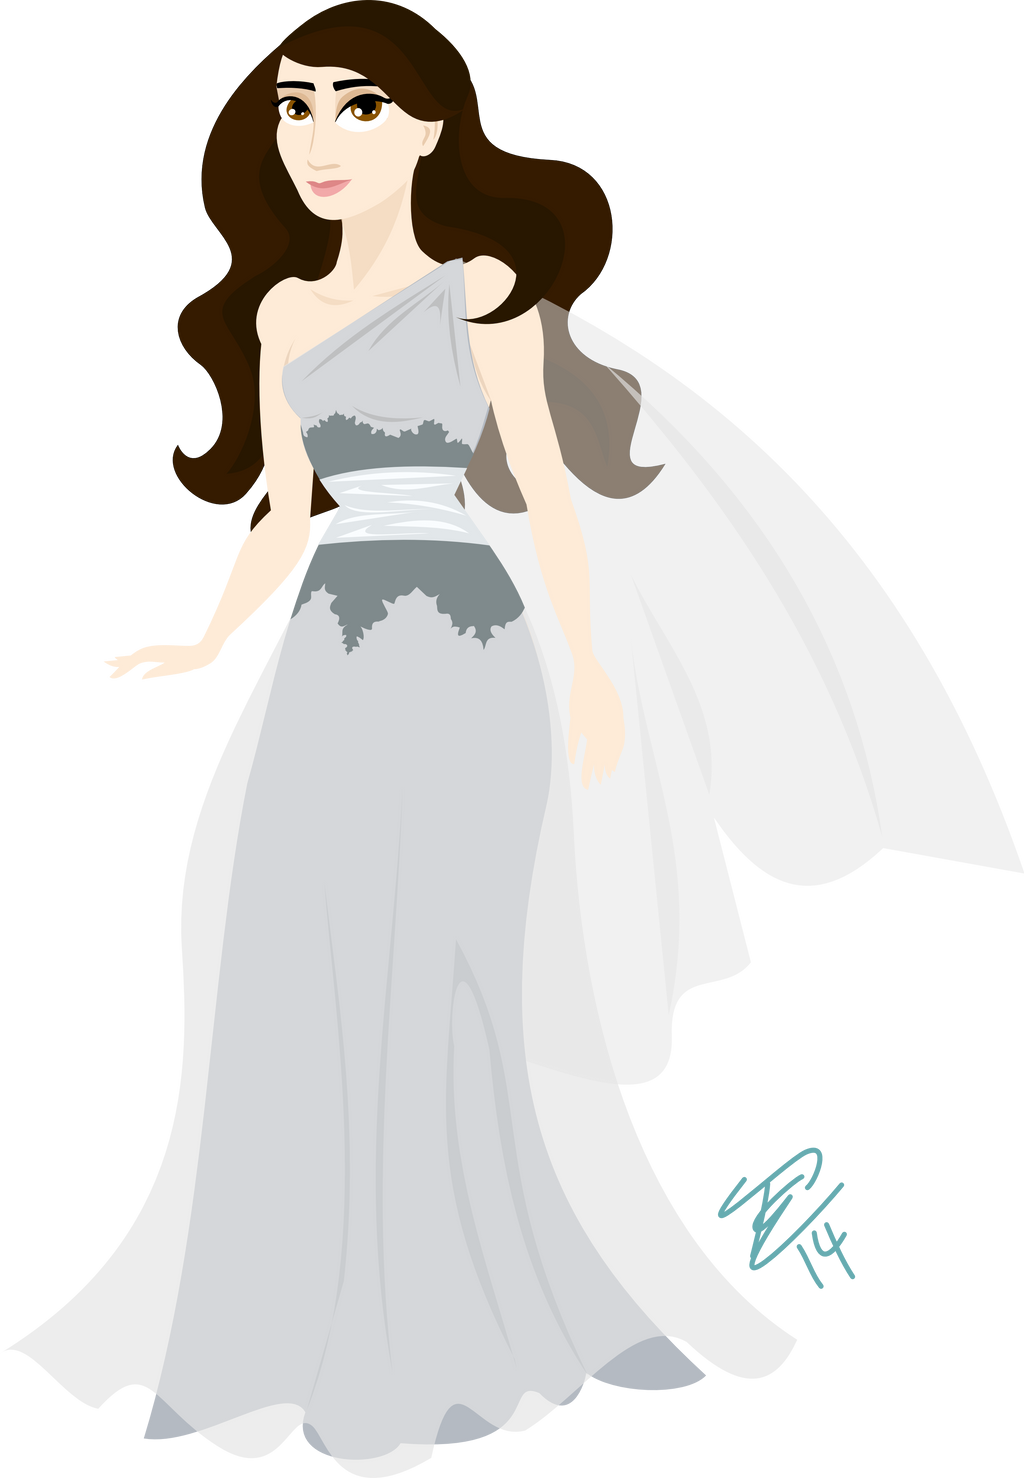 Modern disney princess amelia by tashimenefuseart on deviantart